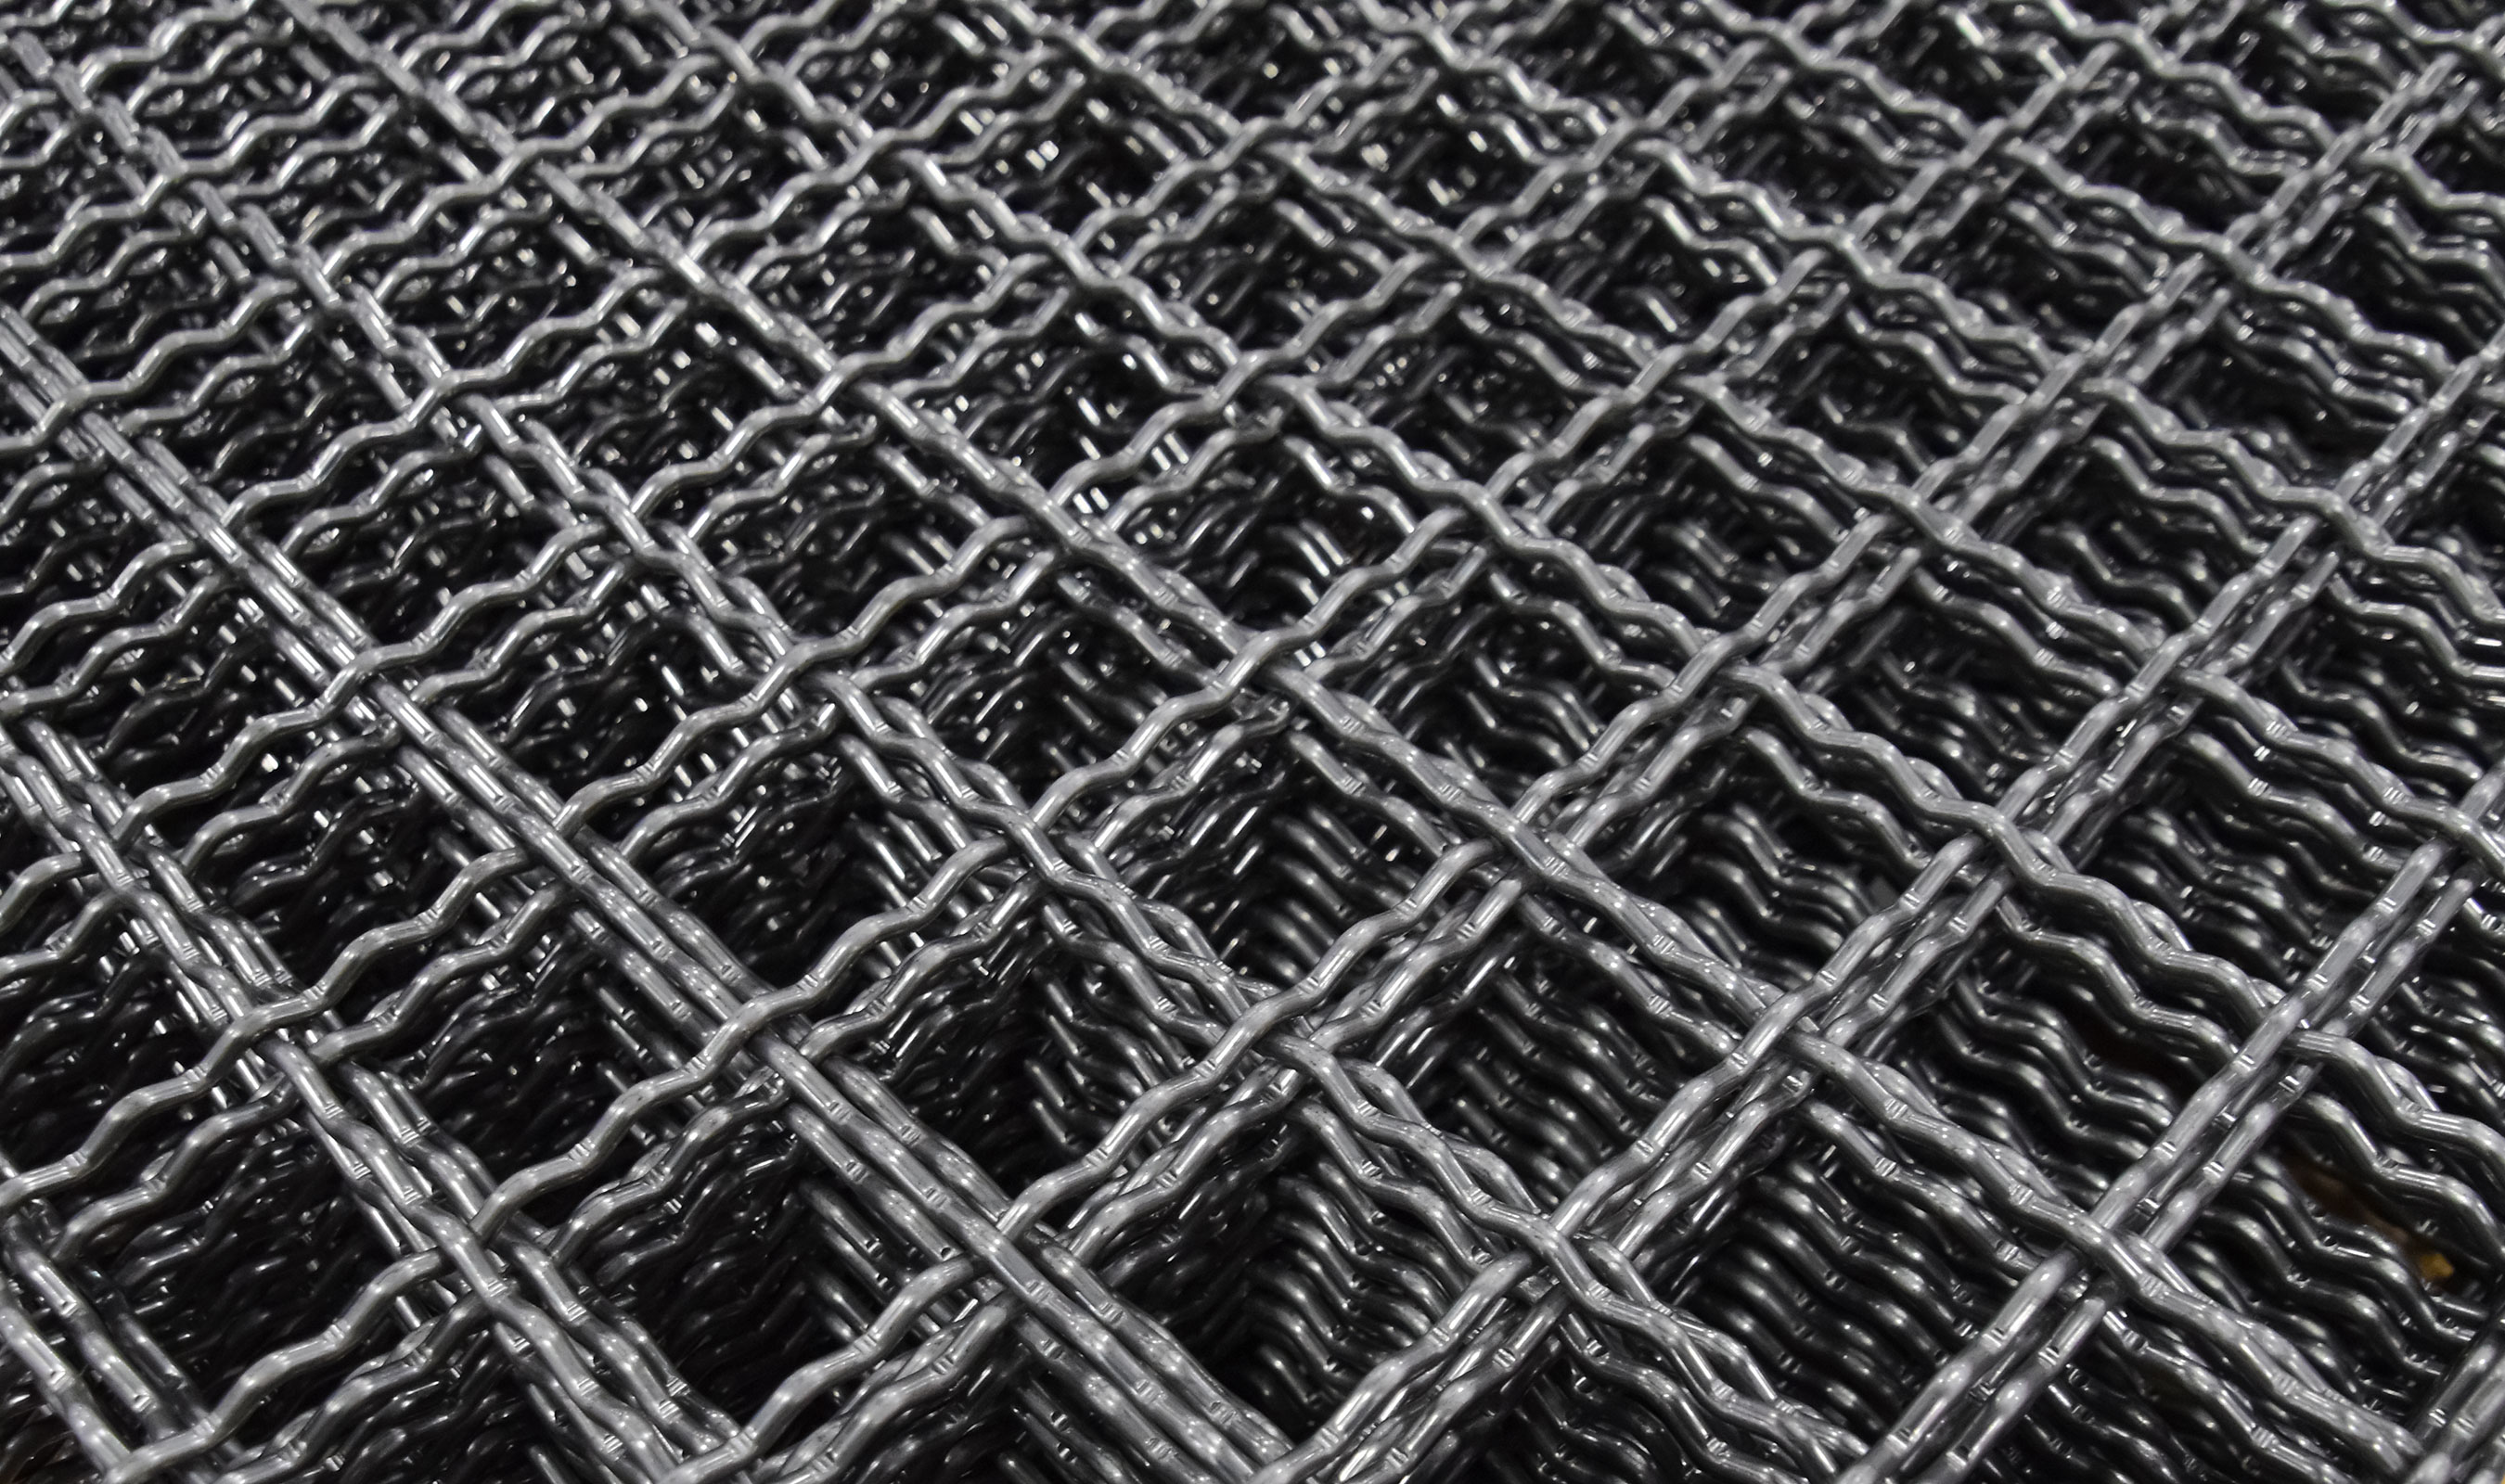 I-48 Intercrimp woven wire mesh in plain steel